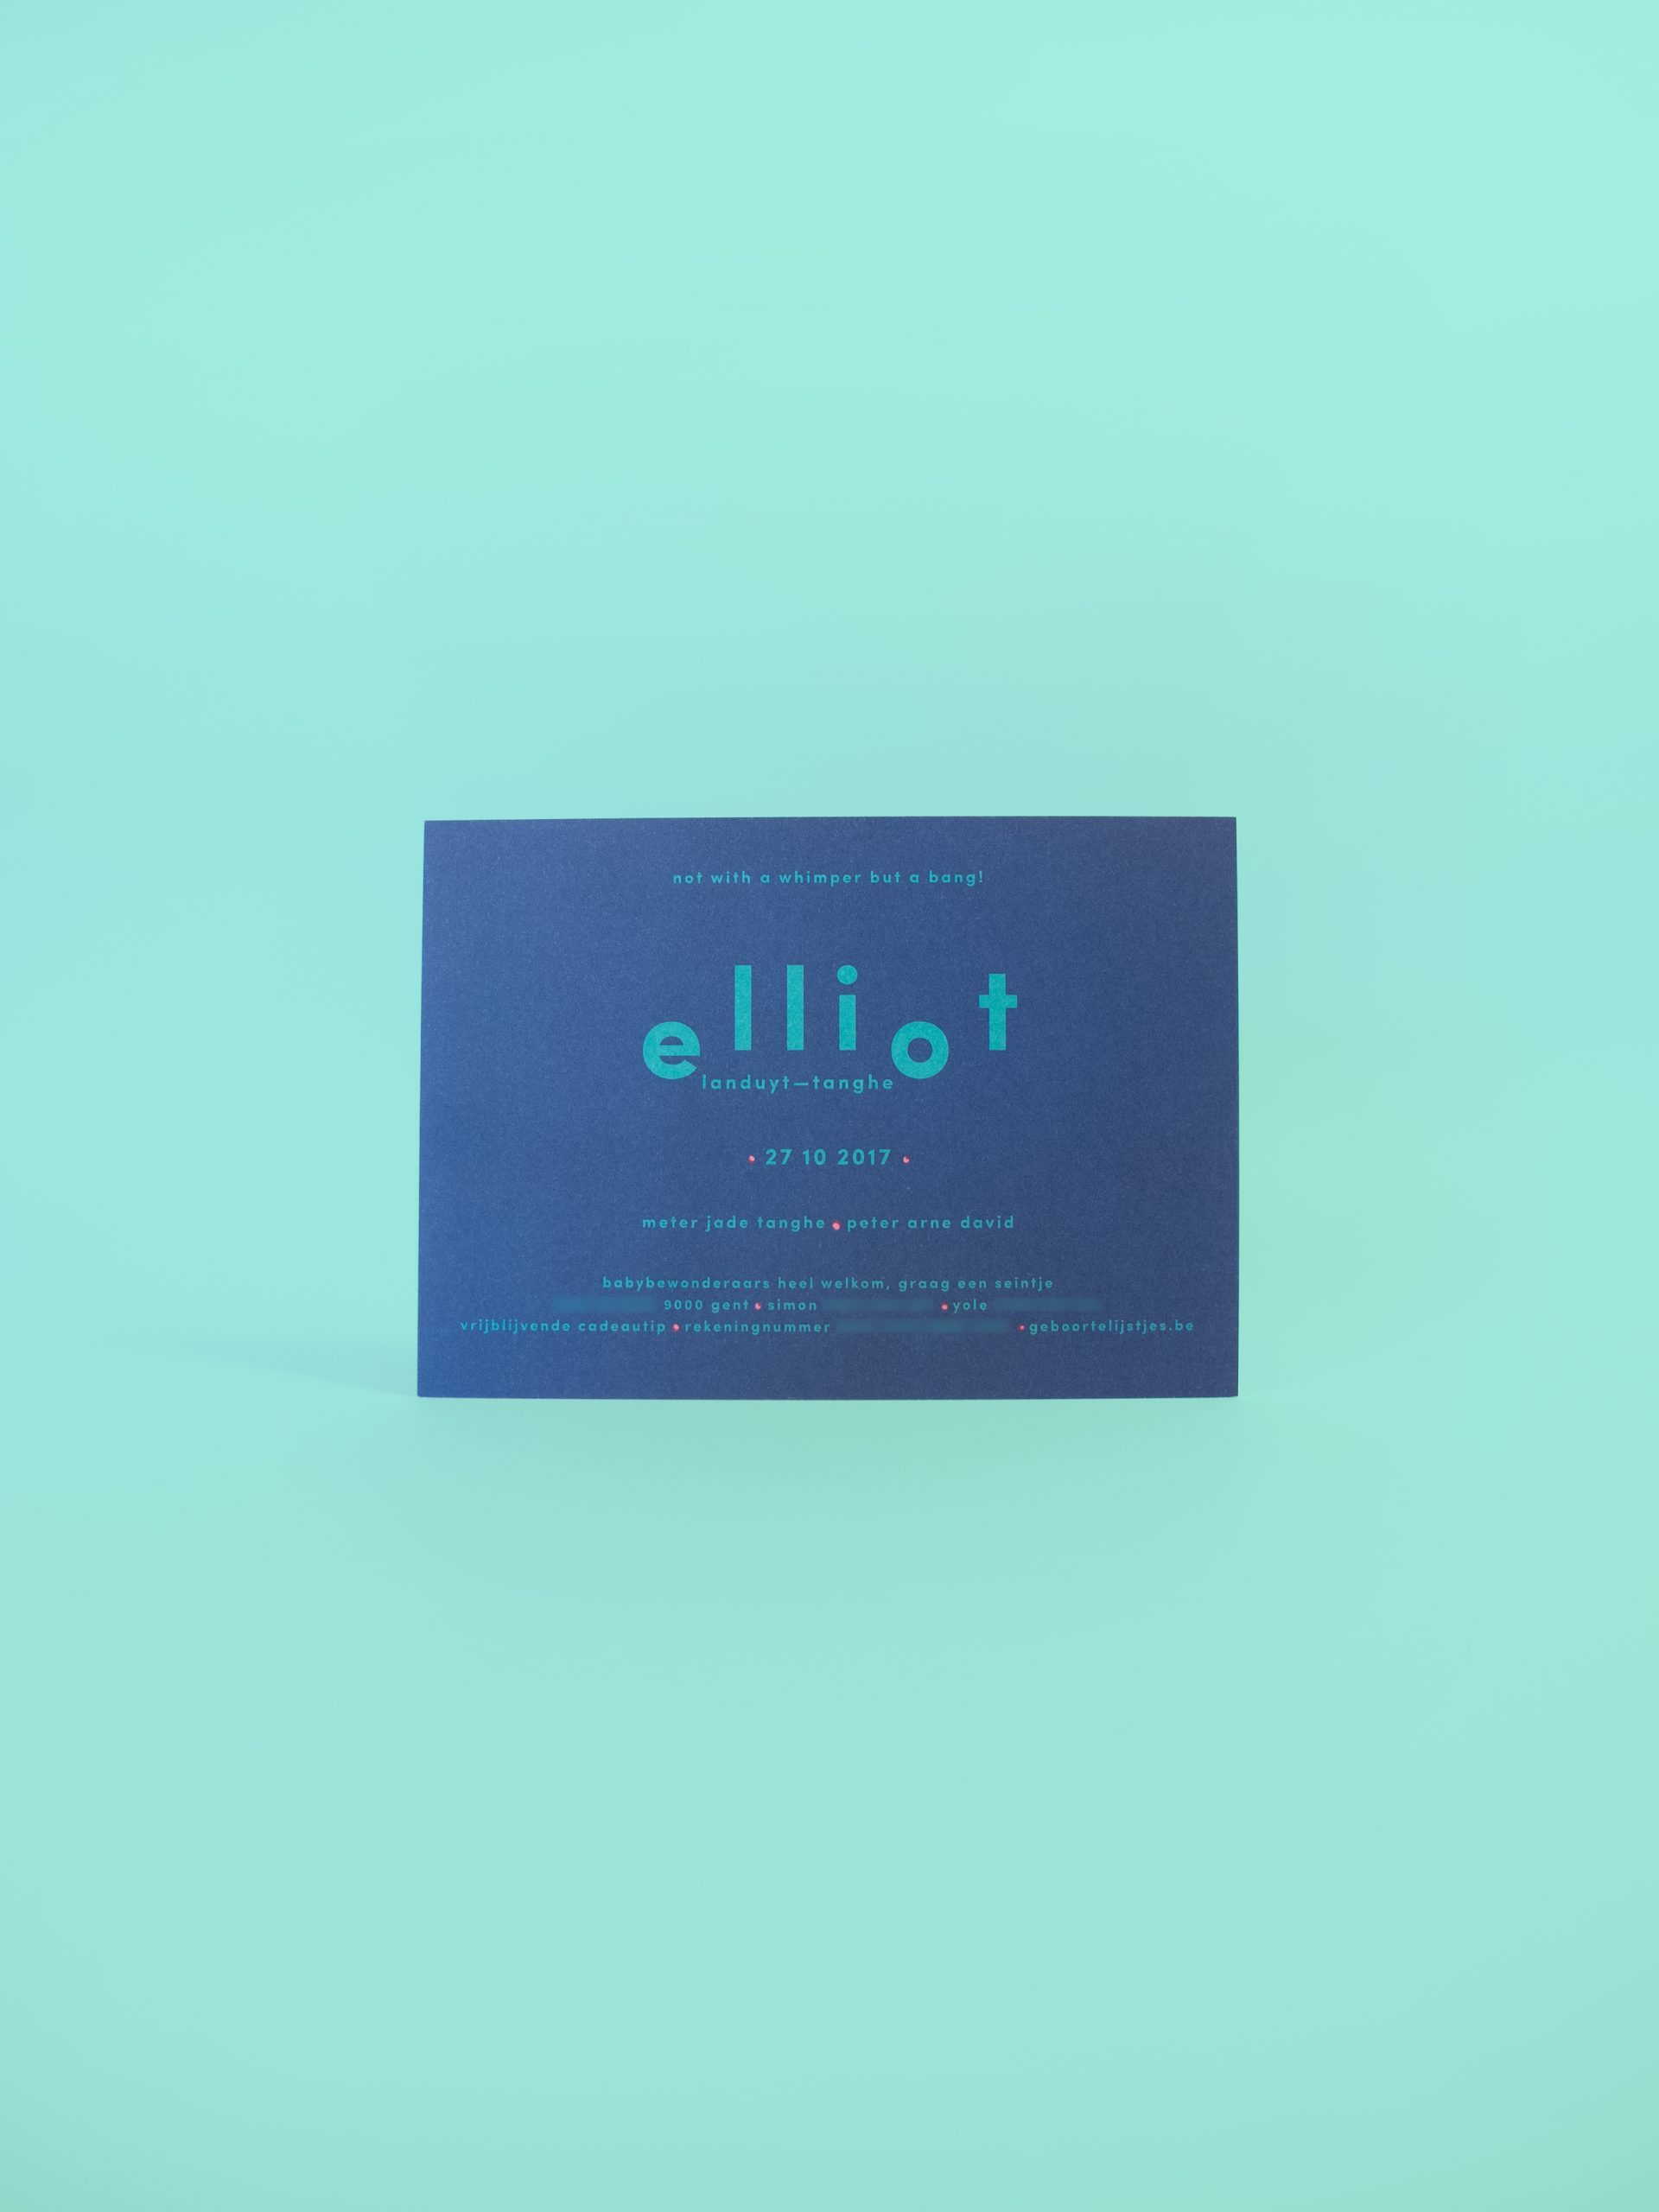 Elliot_2